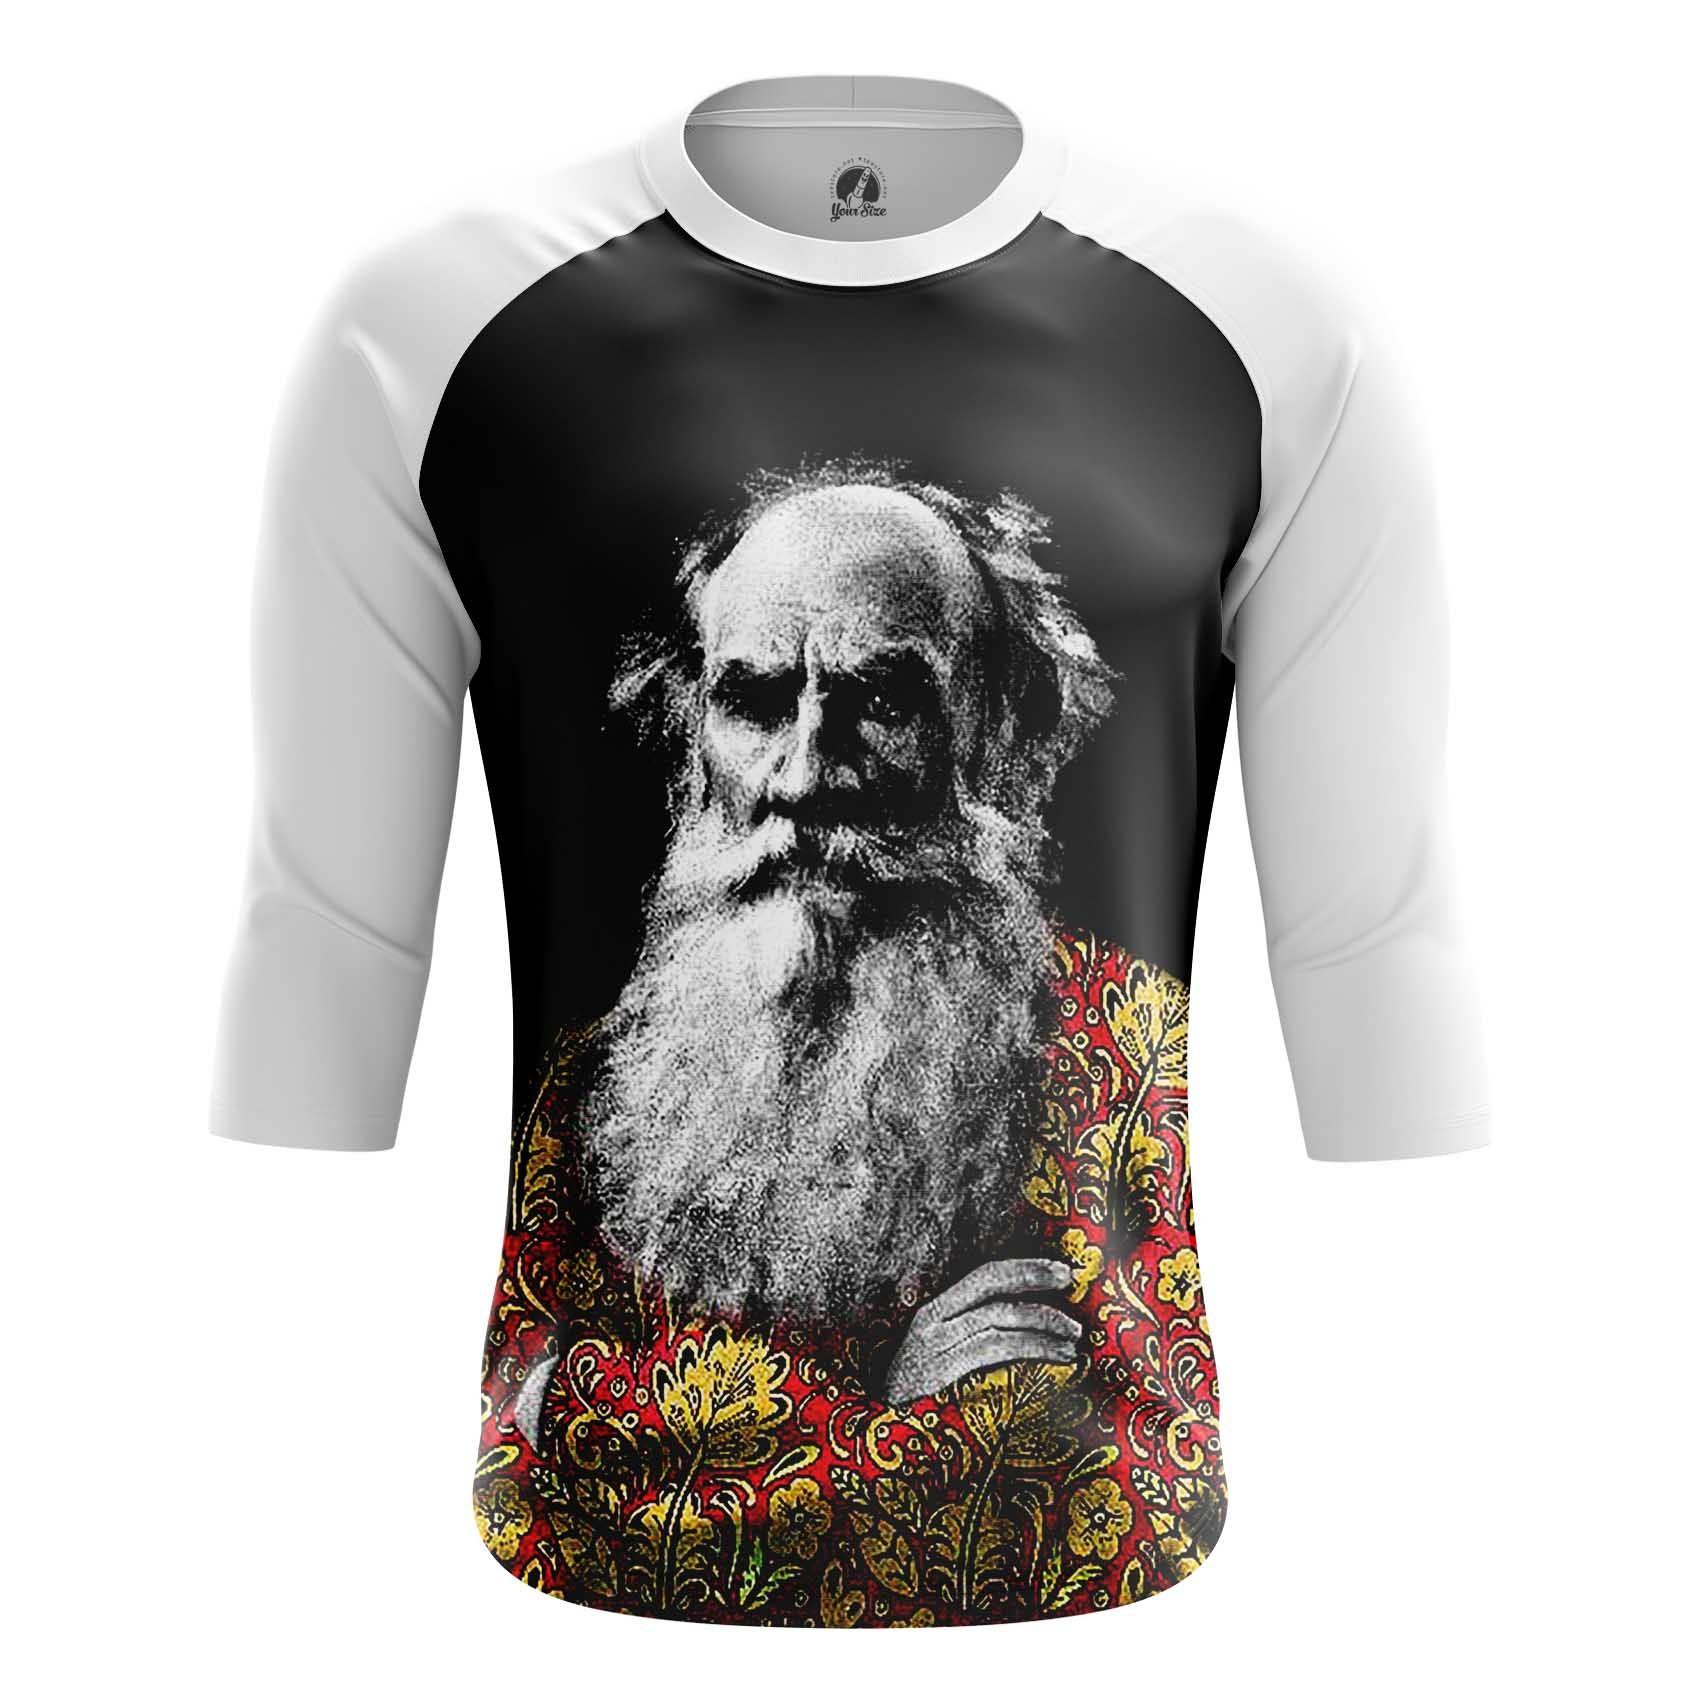 Merchandise Men'S T-Shirt Leo Tolstoy Russian Writer